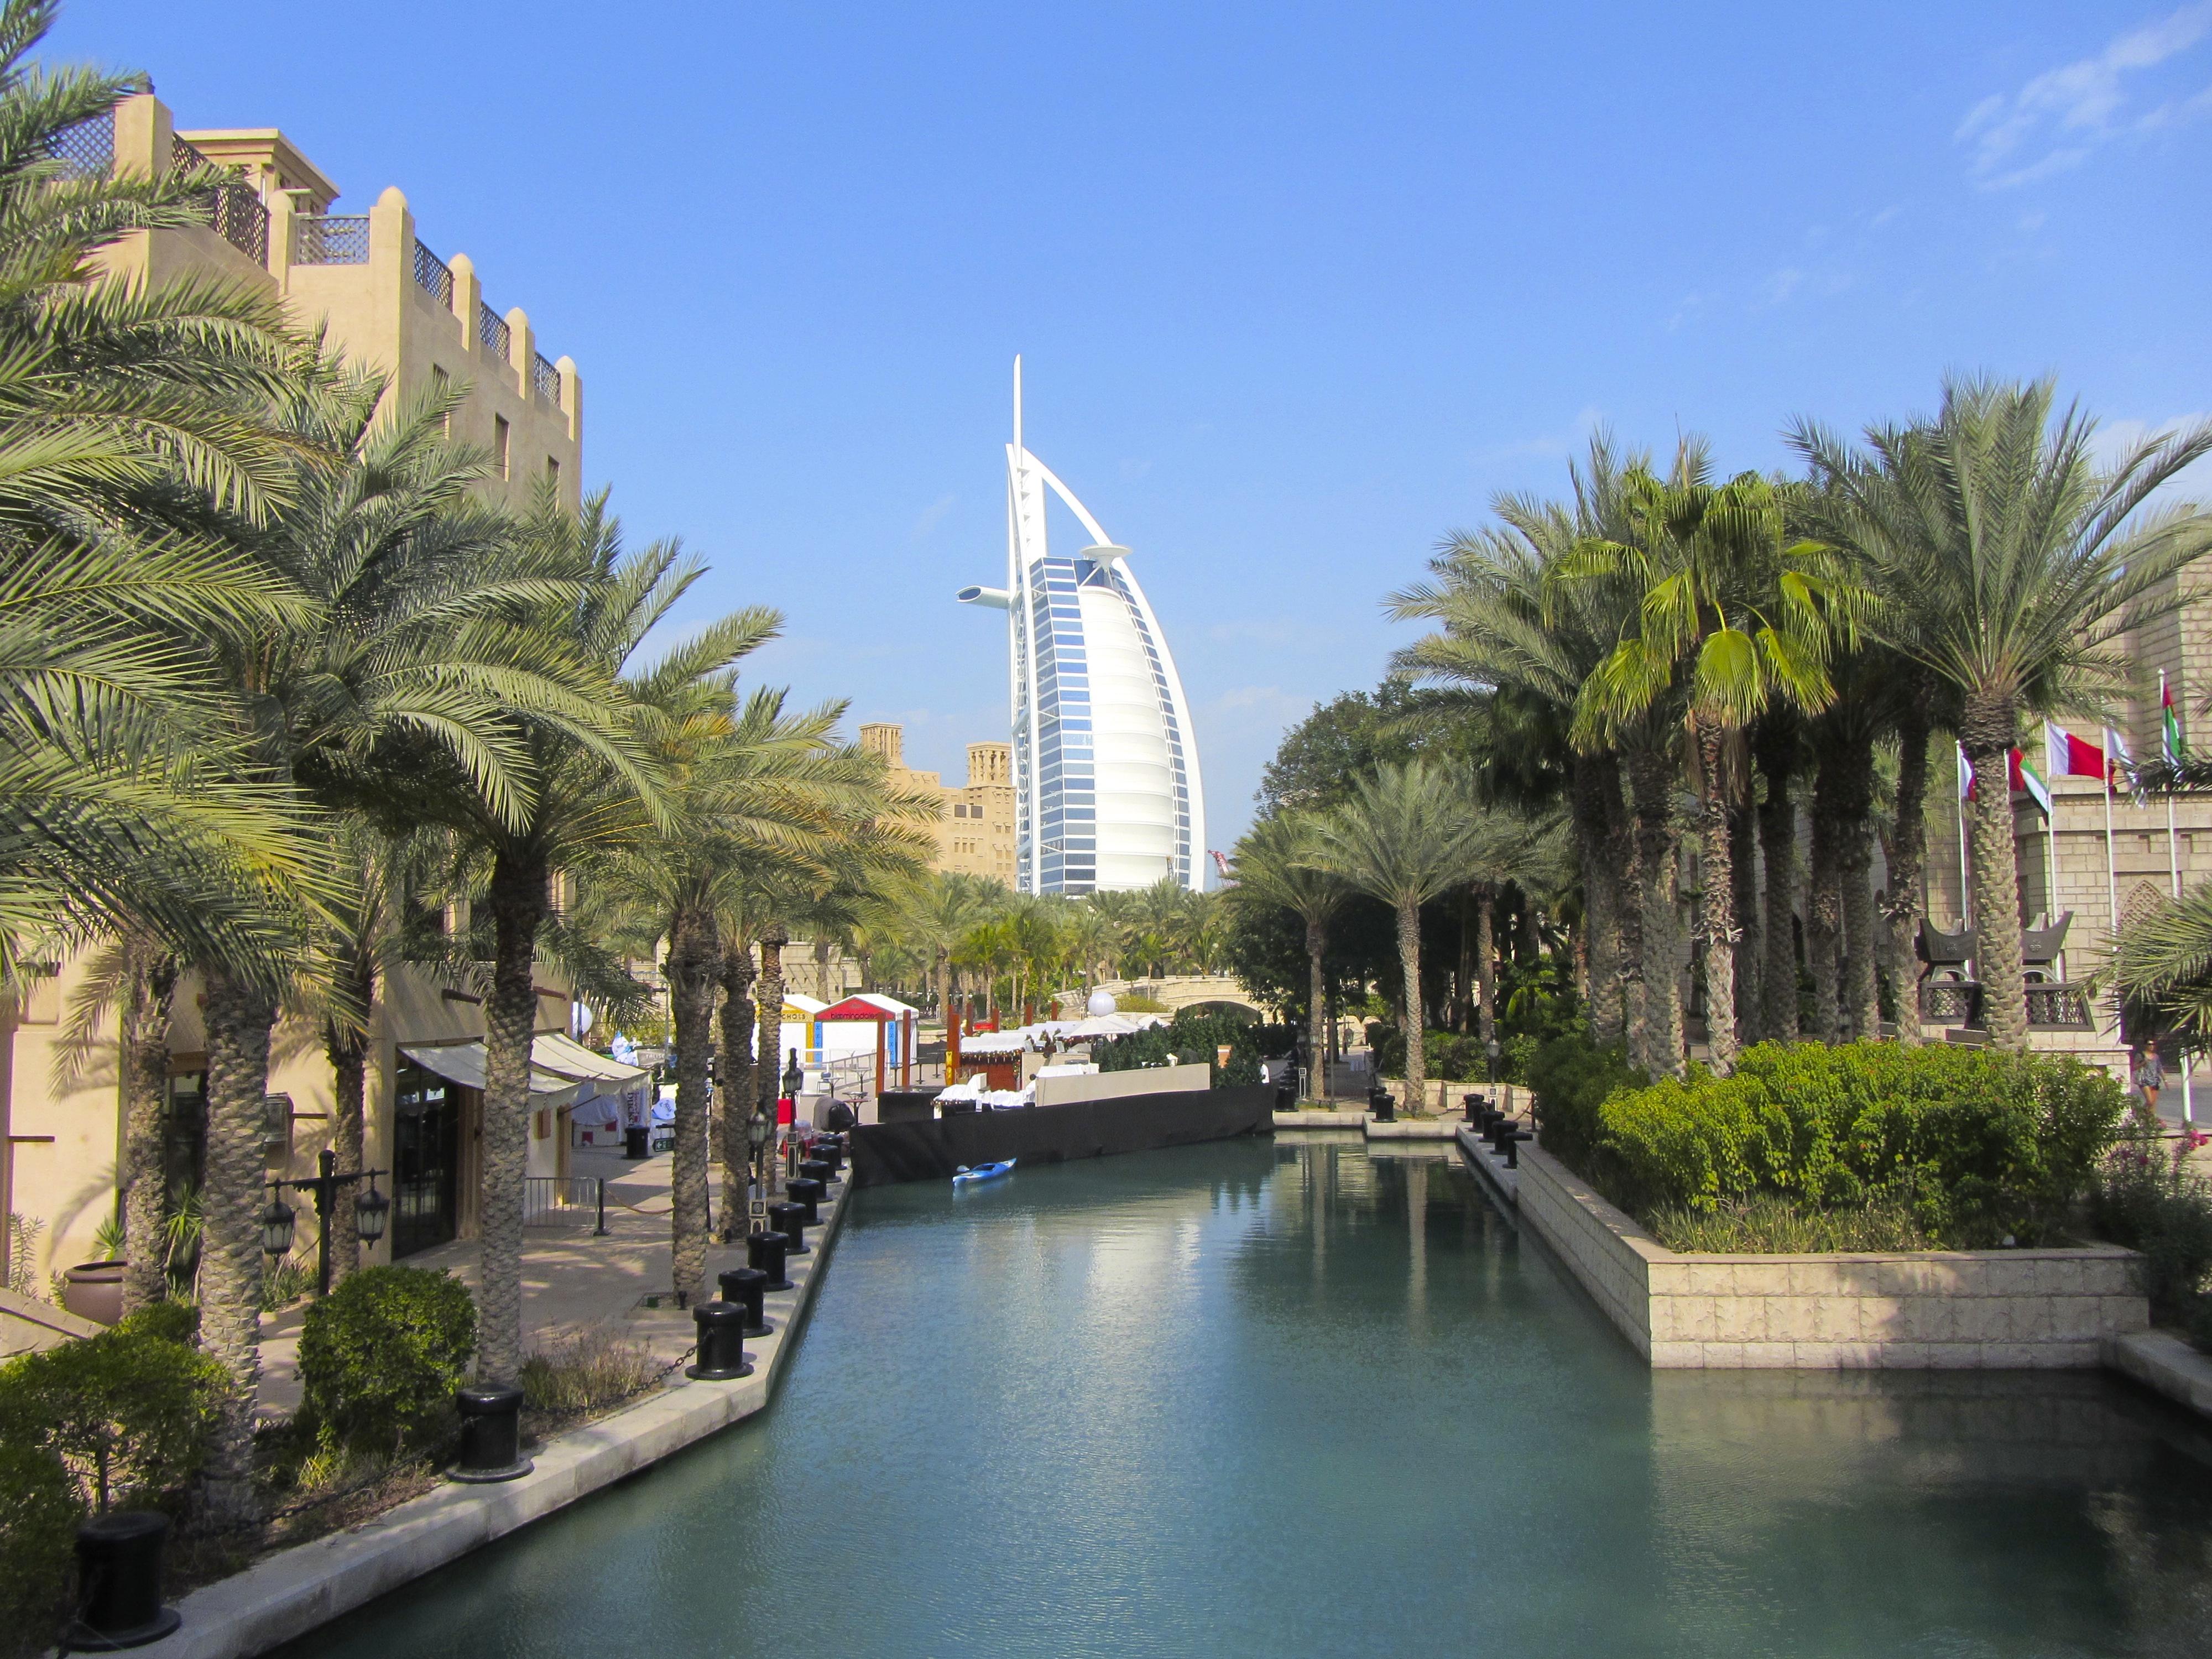 Dubai Top 10 gratis bezienswaardigheden - Reisgenie: reisgenie.nl/dubai-top-10-gratis-bezienswaardigheden